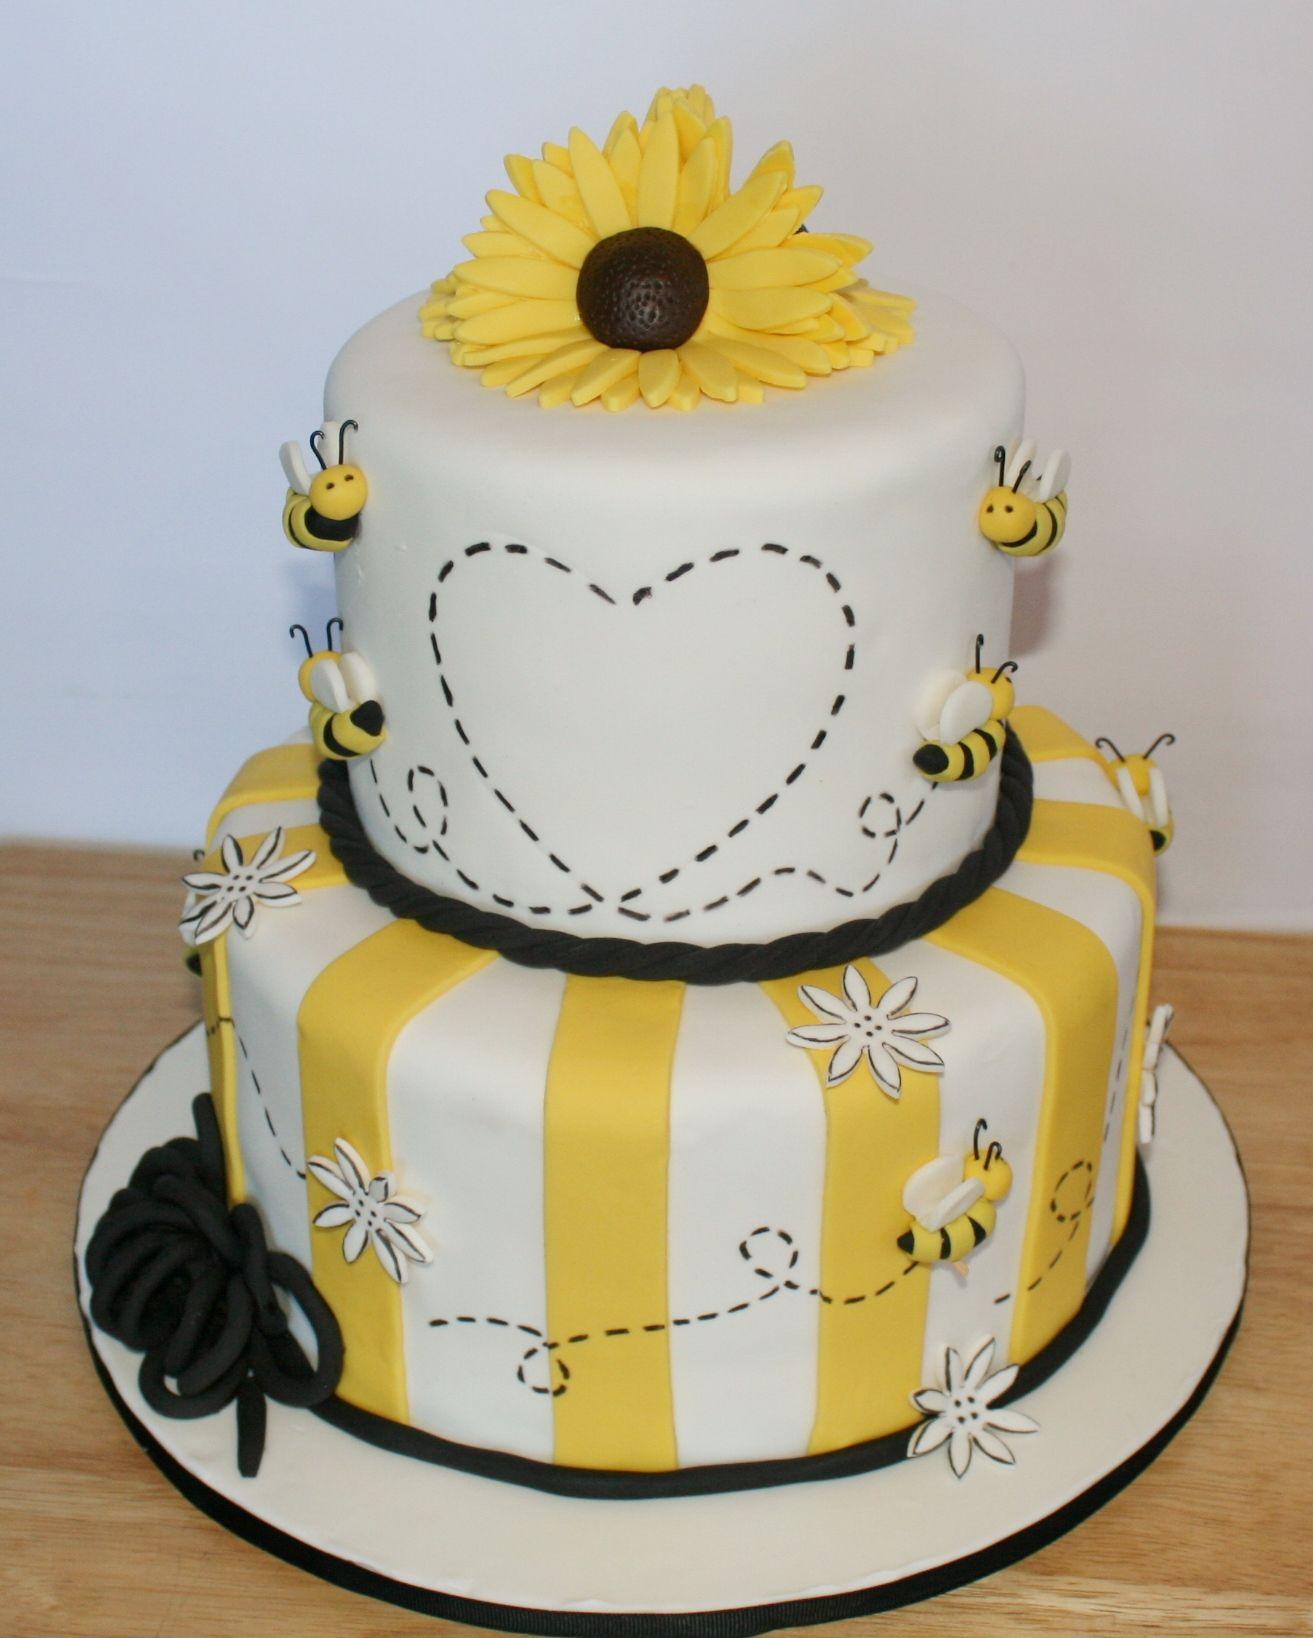 Honey Bee Baby Shower Cake By KB Cakes KBCakesme Facebook